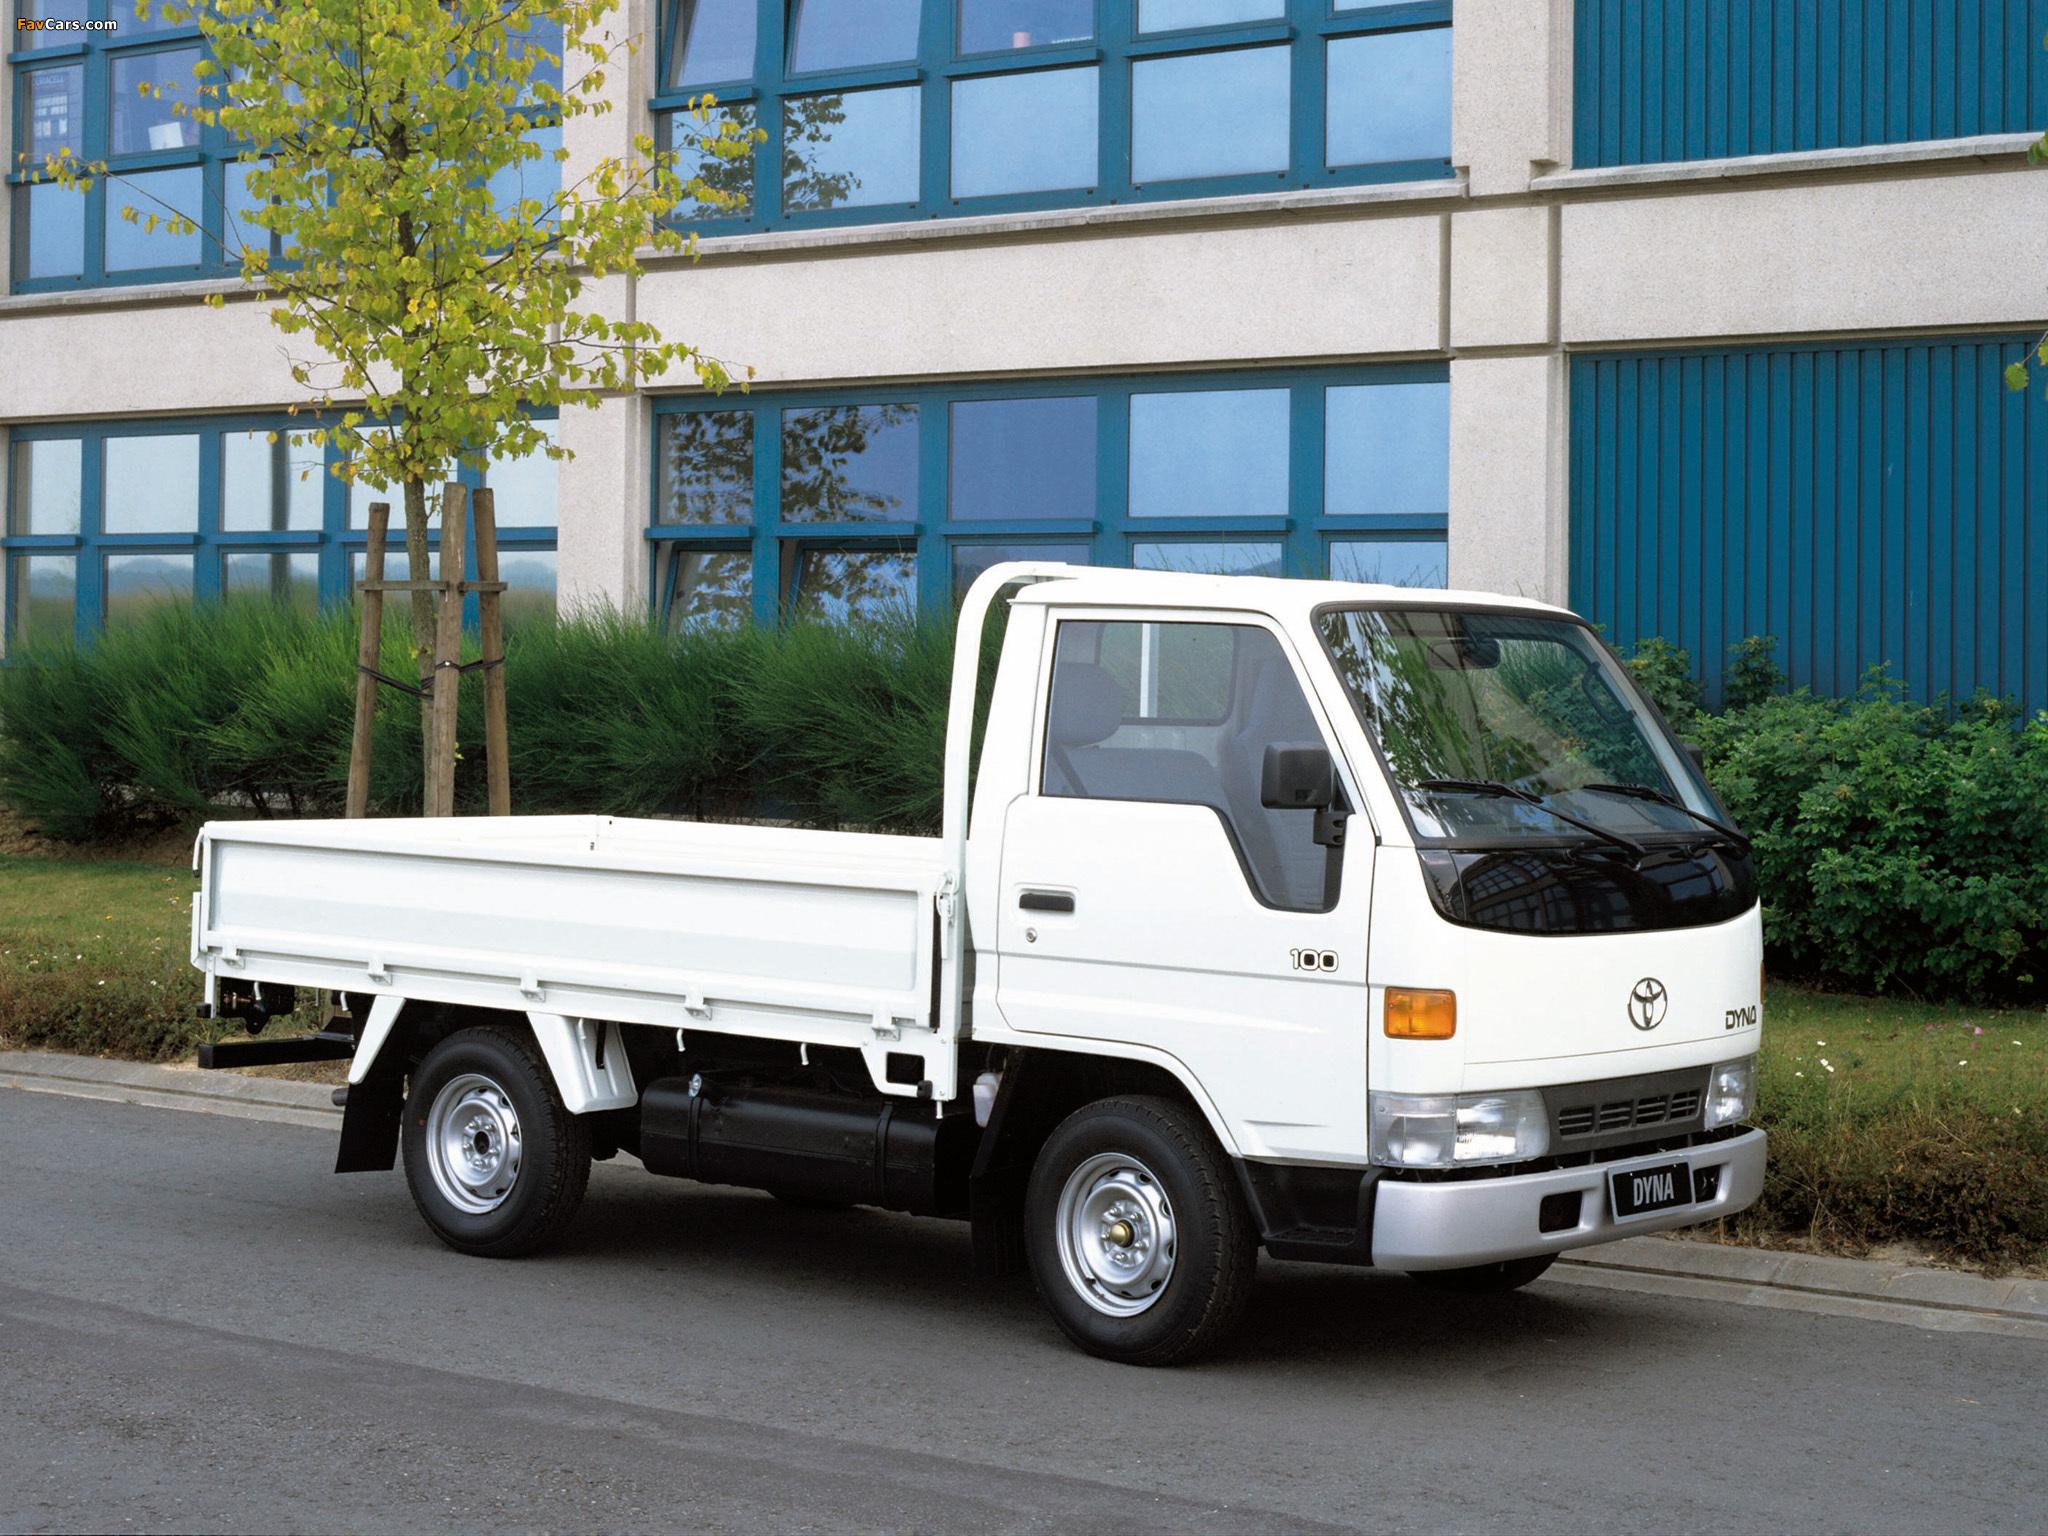 Kelebihan Toyota Dyna 100 Perbandingan Harga